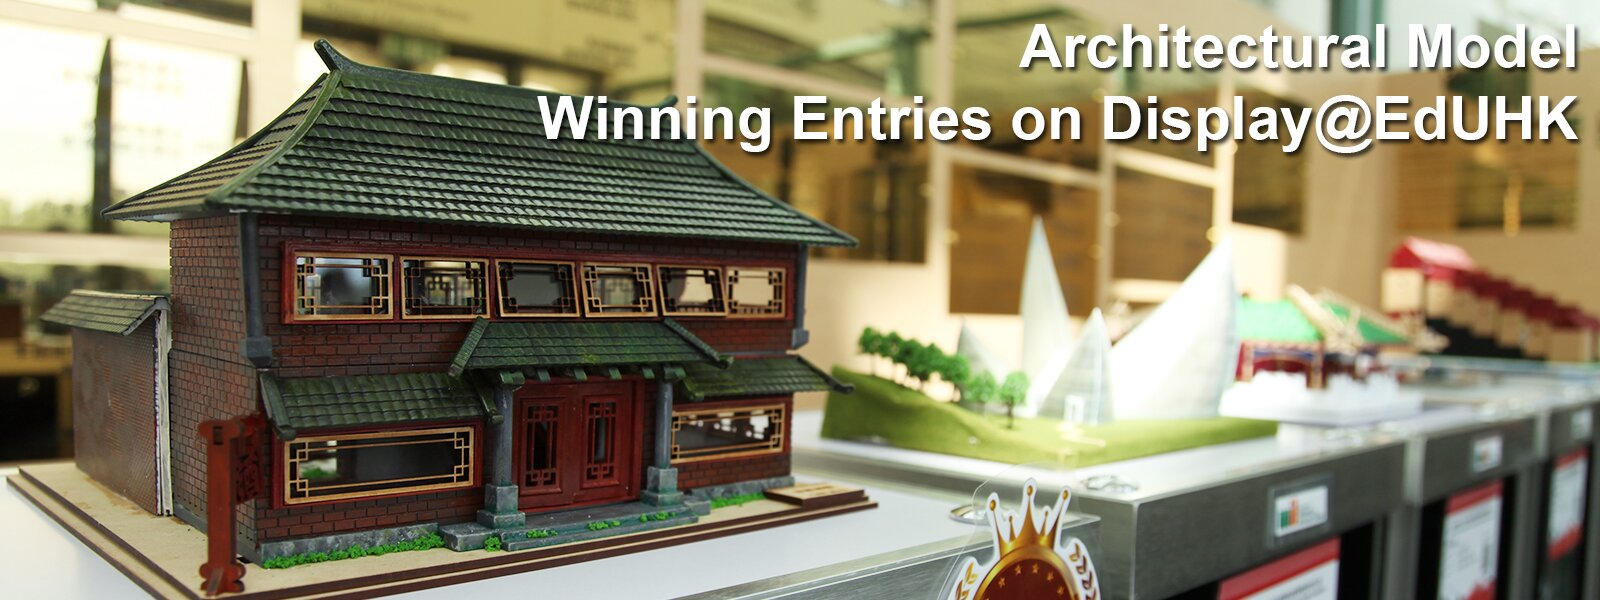 Architectural Model Winning Entries on Display@EdUHK